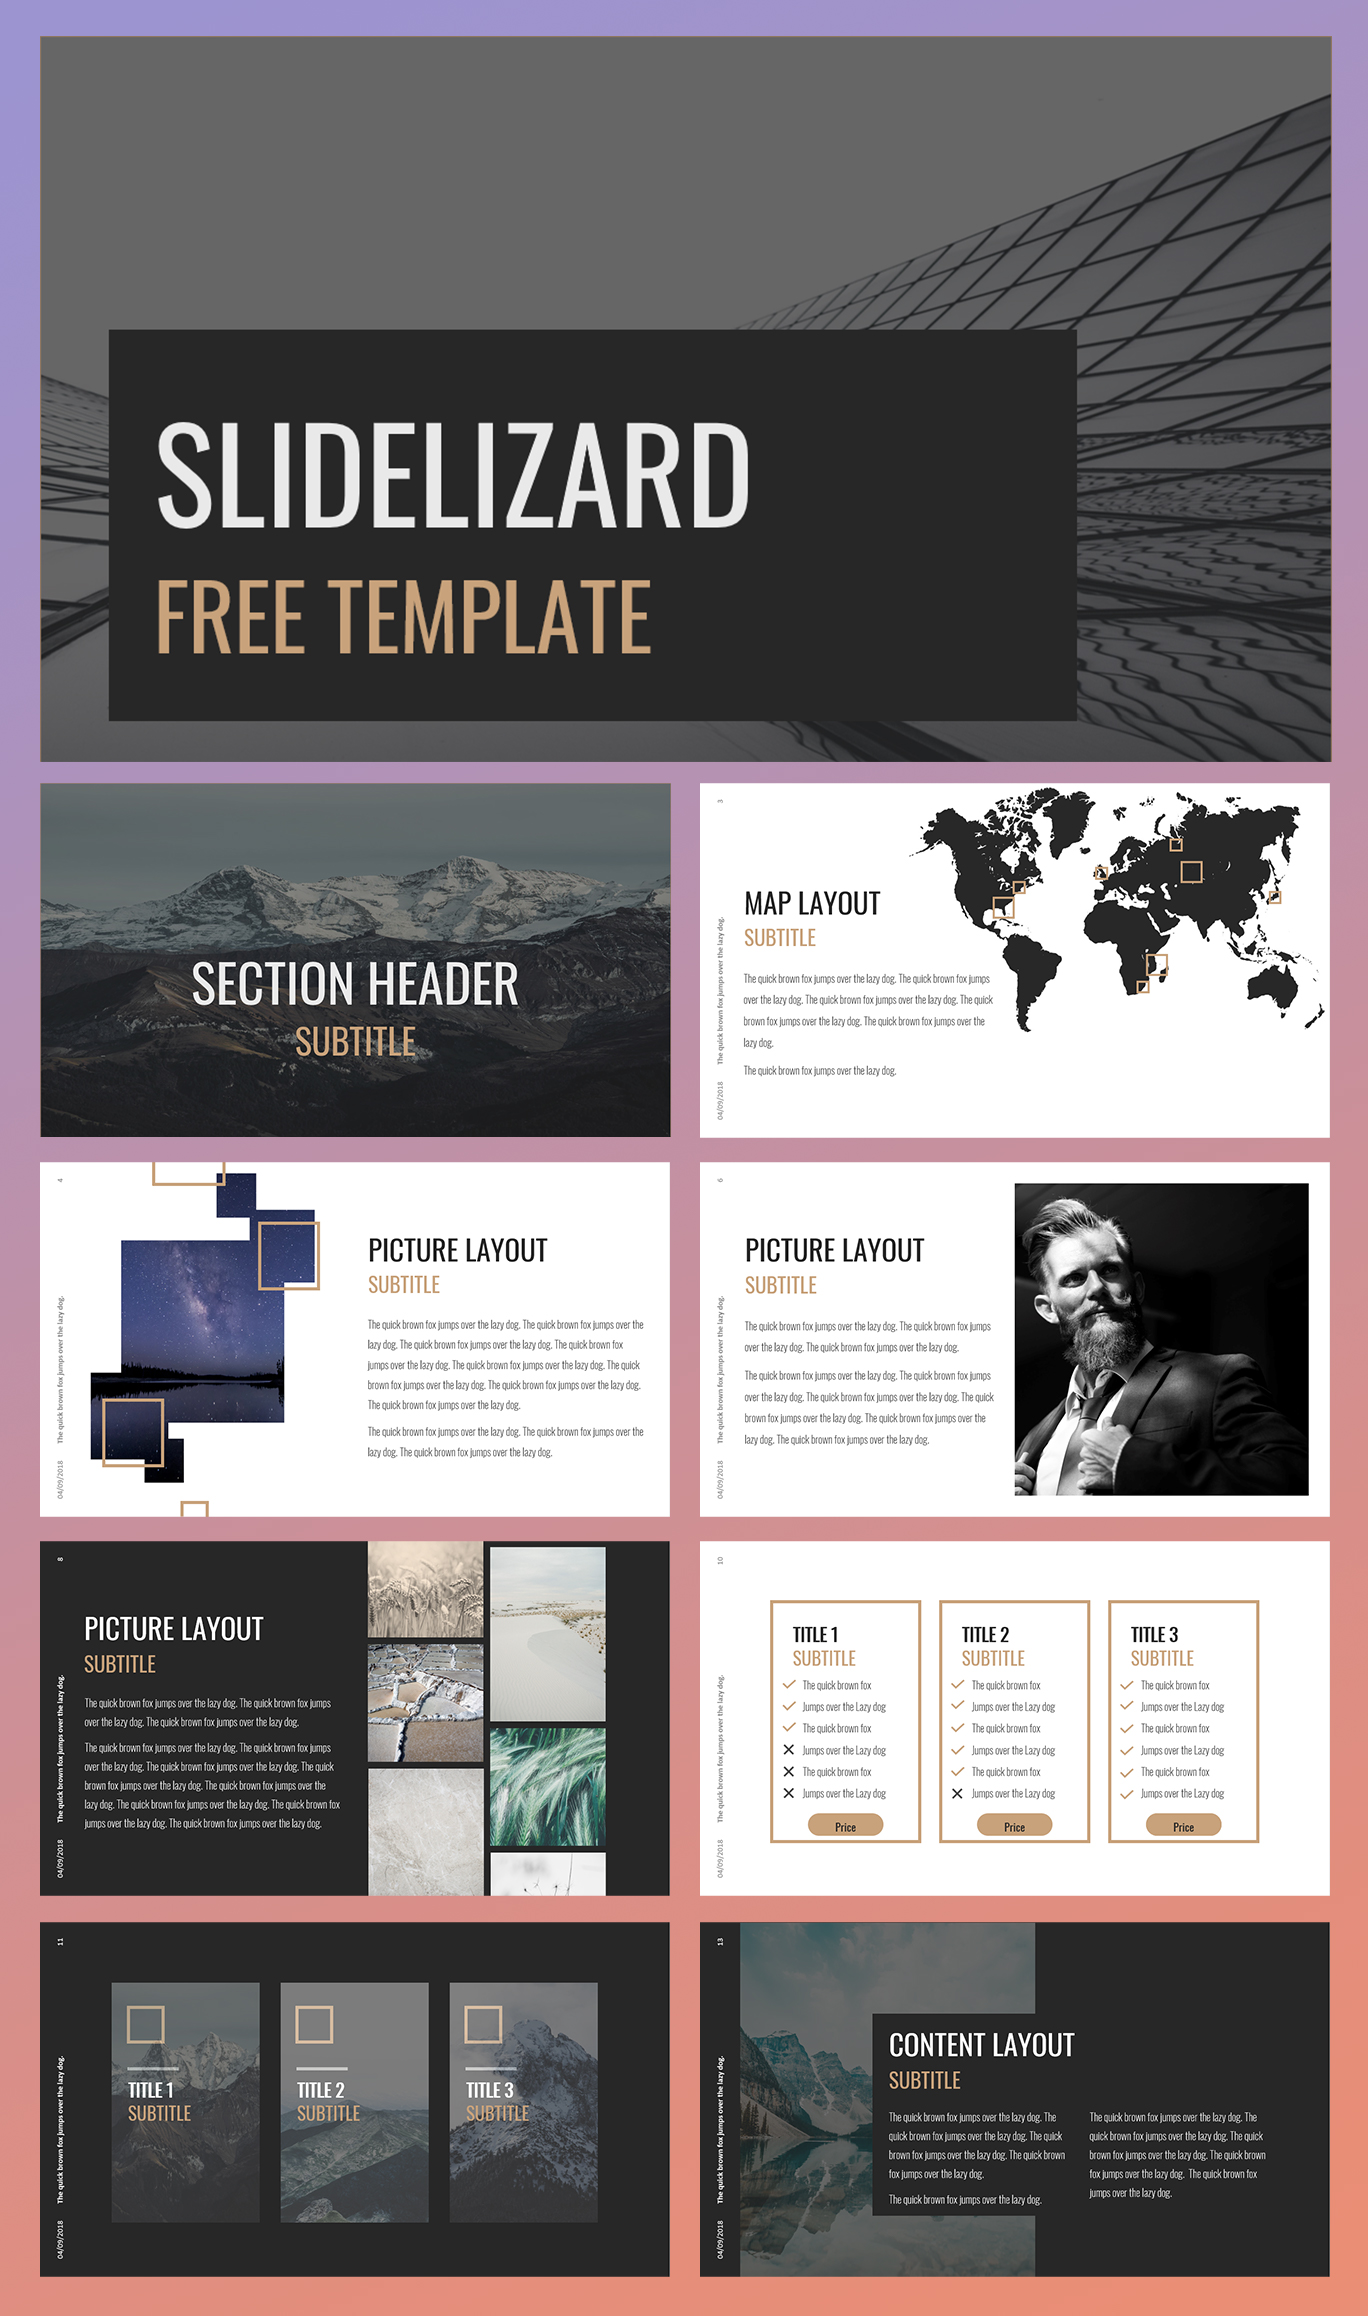 Elegant Architecture Free Powerpoint Template Slidelizard